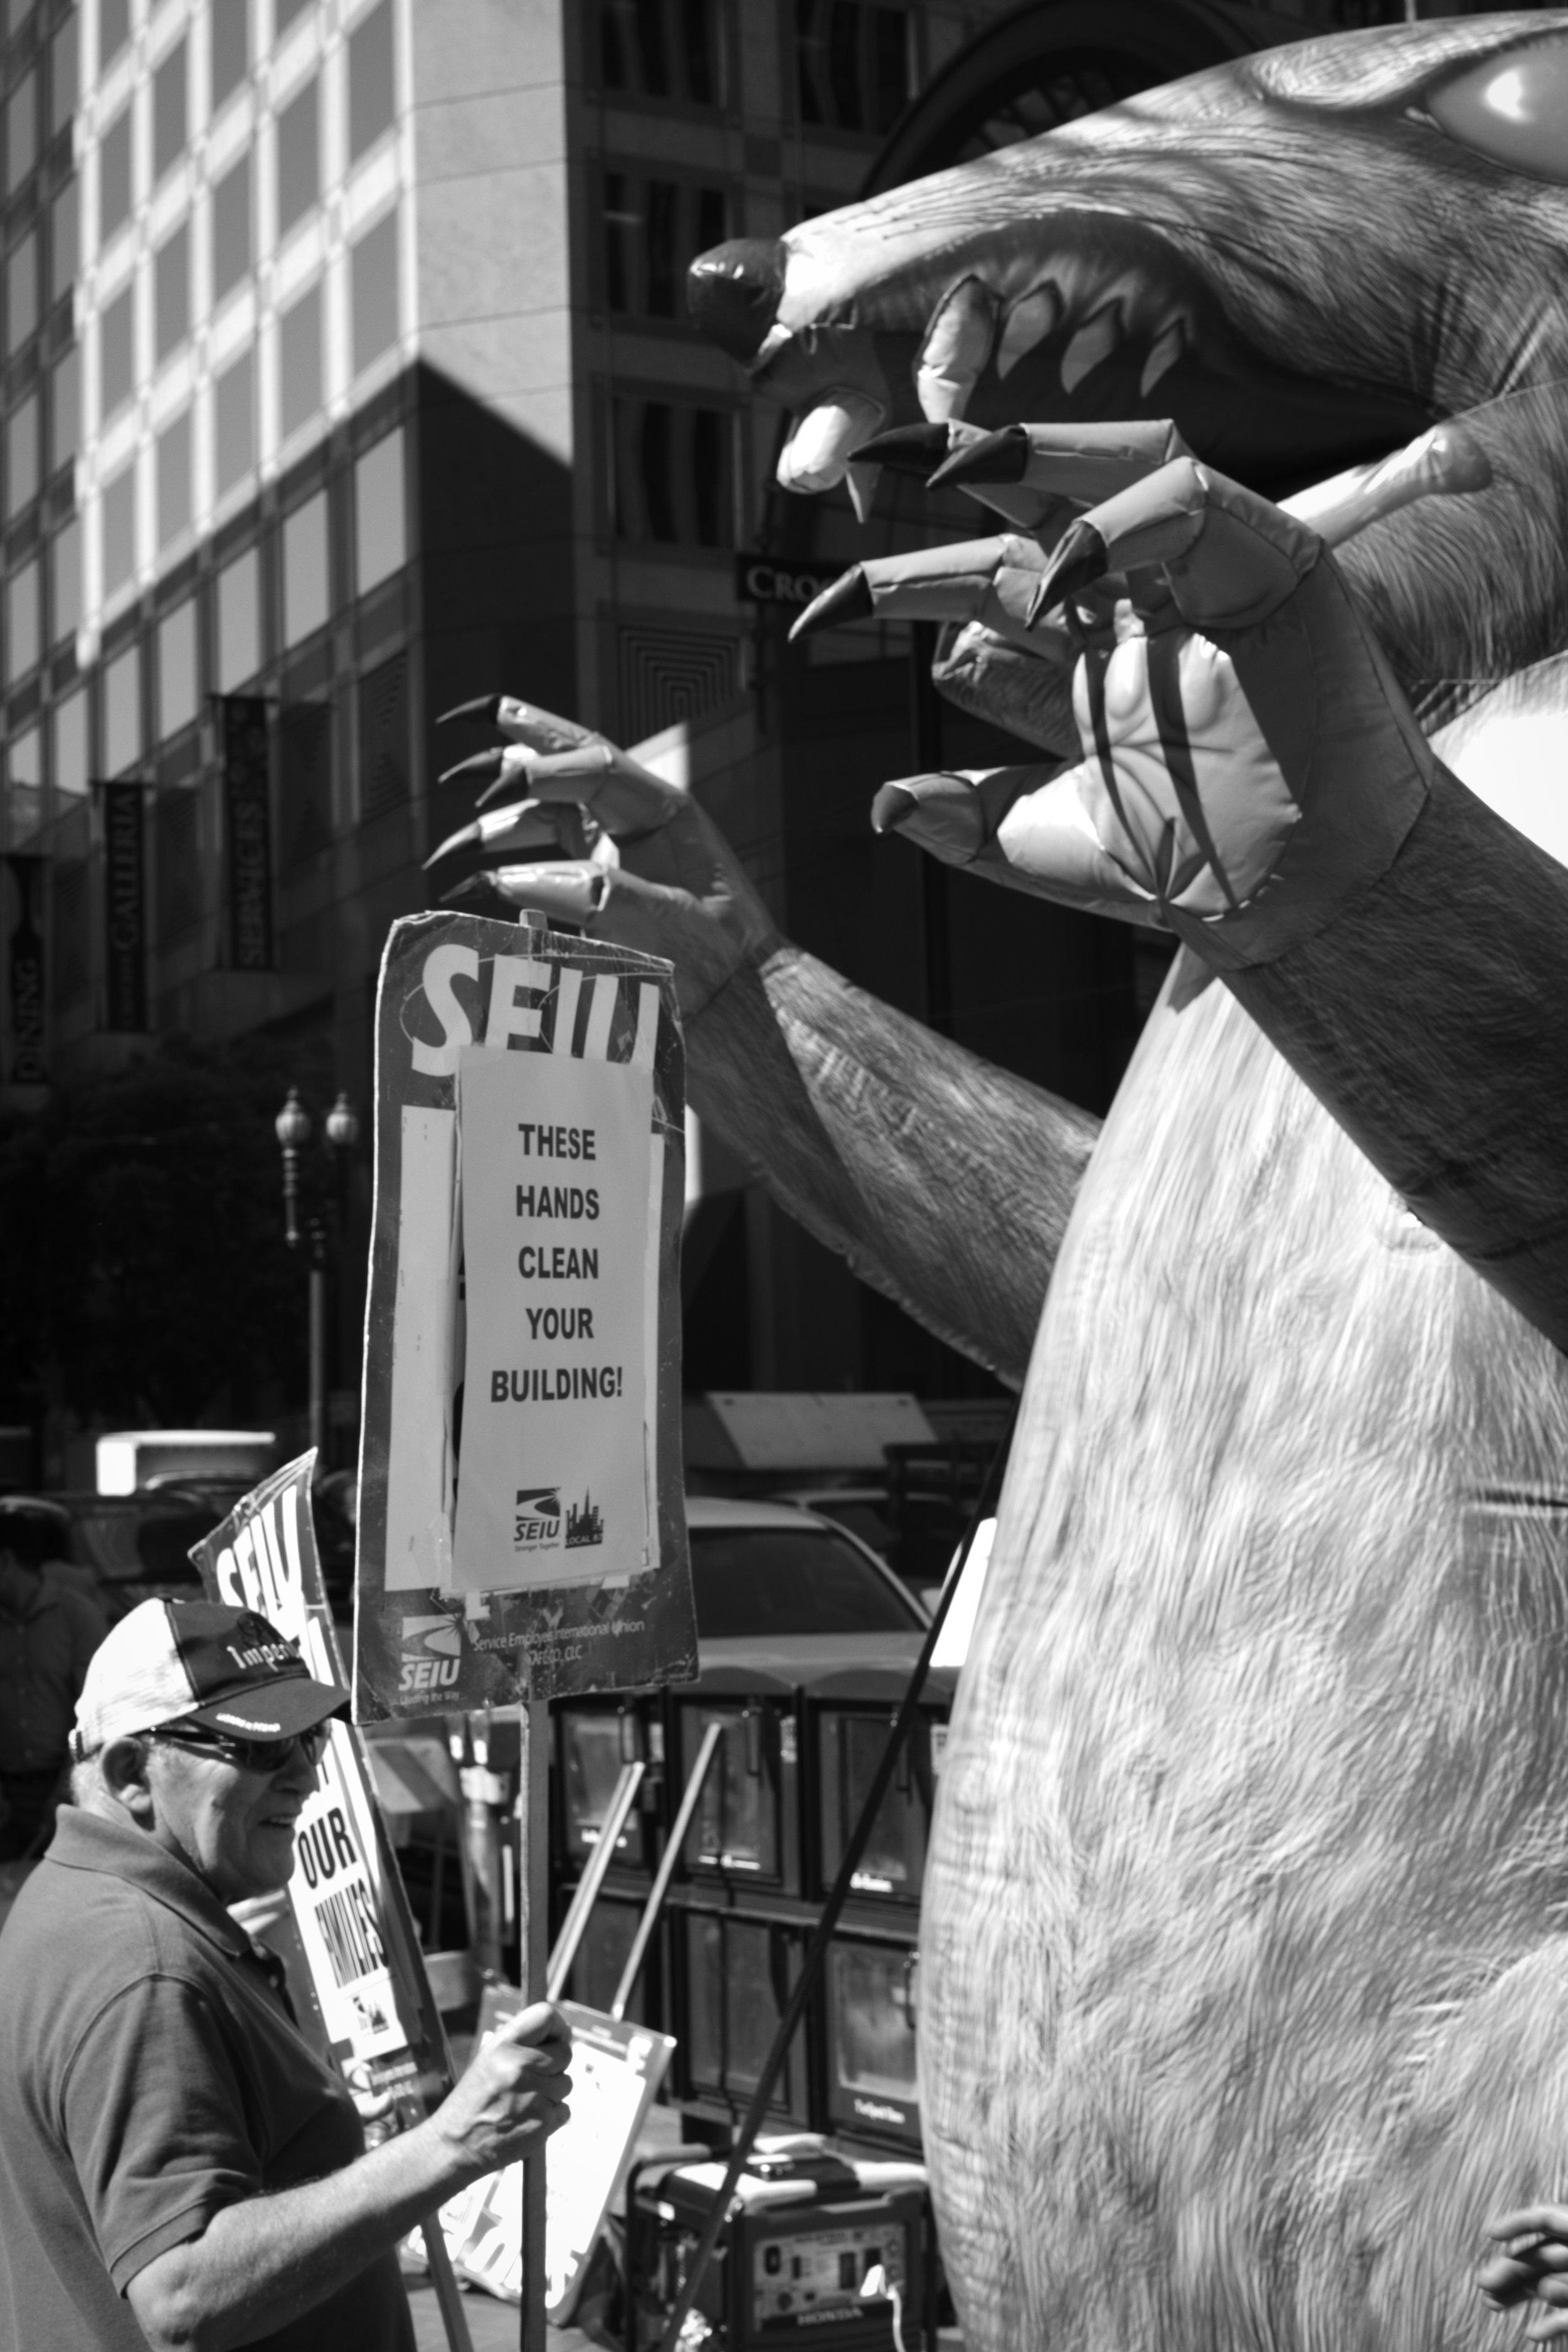 Ratman San Francisco, USA Leica M (Typ 246) 50mm f/2.0 APO Summicron  © Keith R. Sbiral, 2018